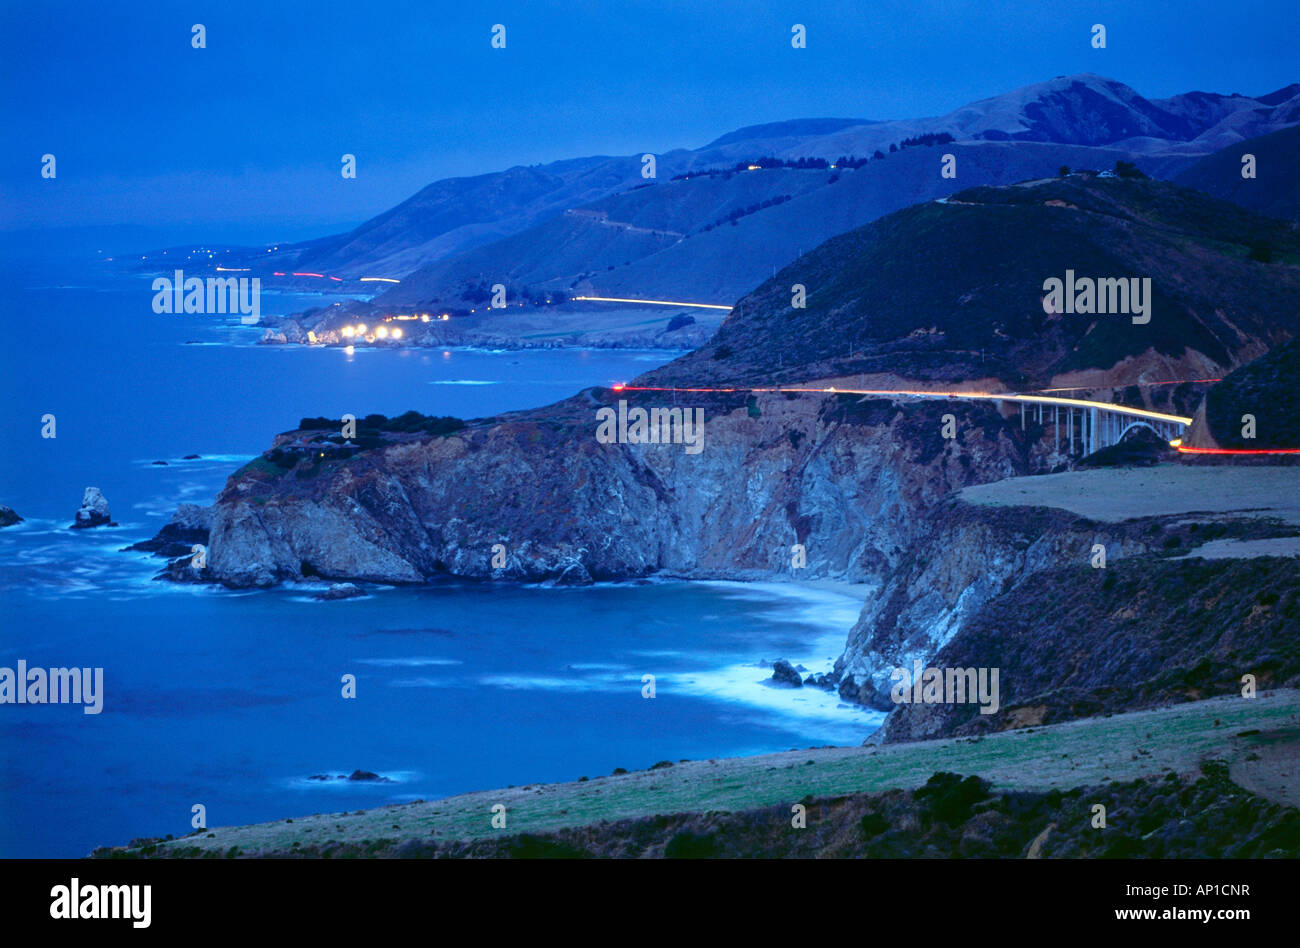 Coastline at Bixitie Bridge near Big Sur, Santa Lucia Range, Highway 1, California, USA - Stock Image